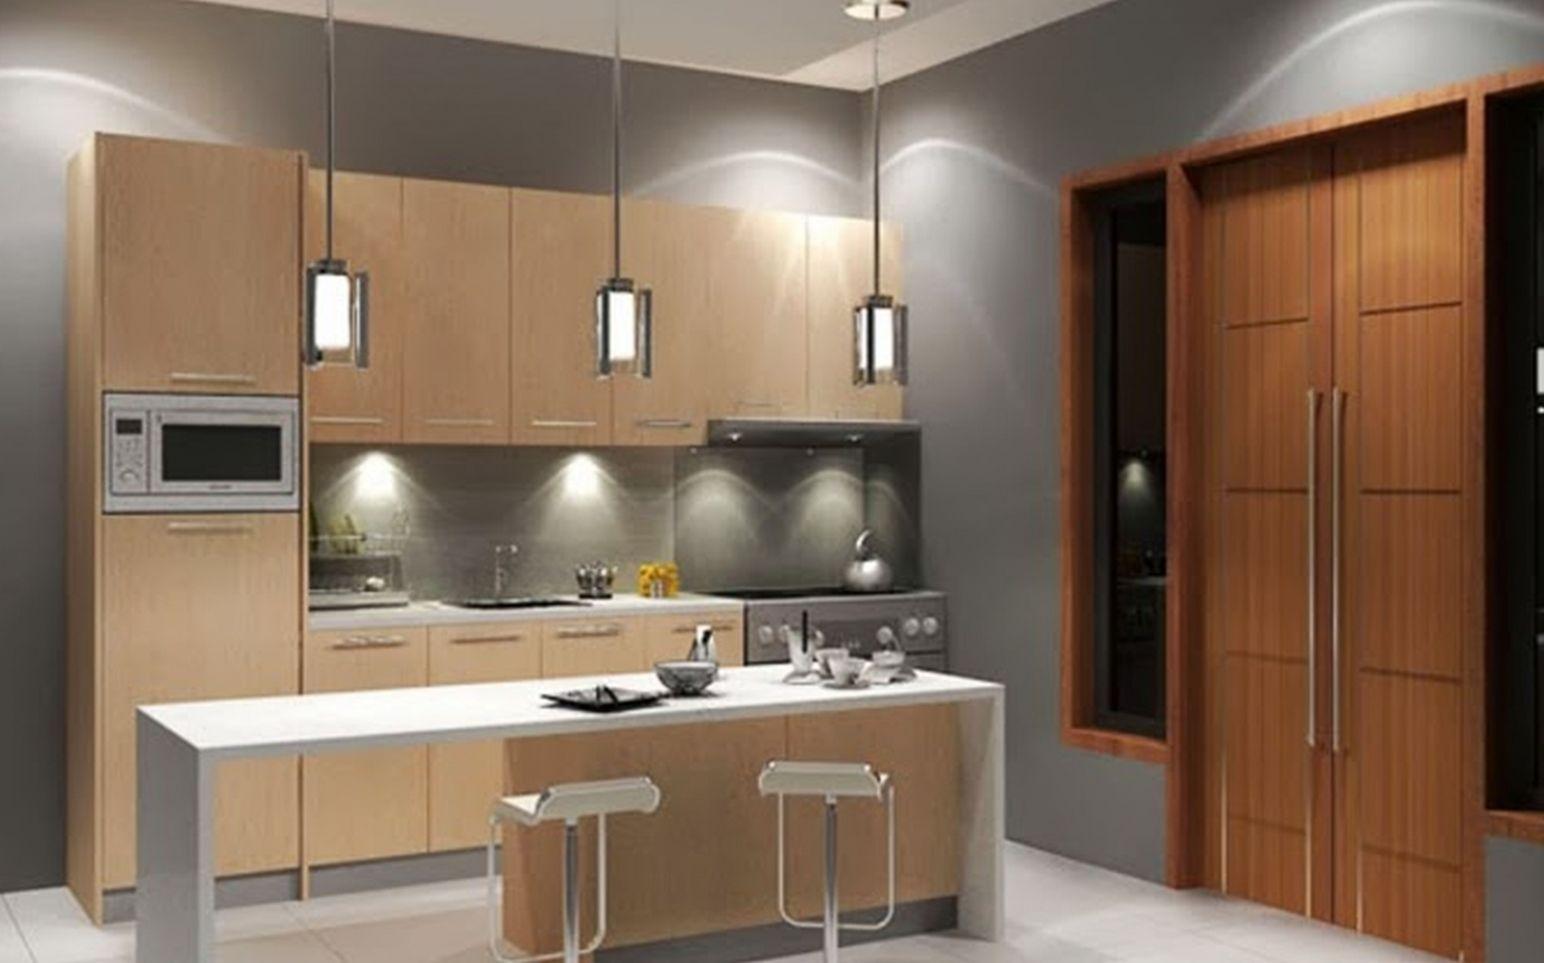 100+ Kitchen Remodeling software Free - Kitchen Design Ideas Images ...